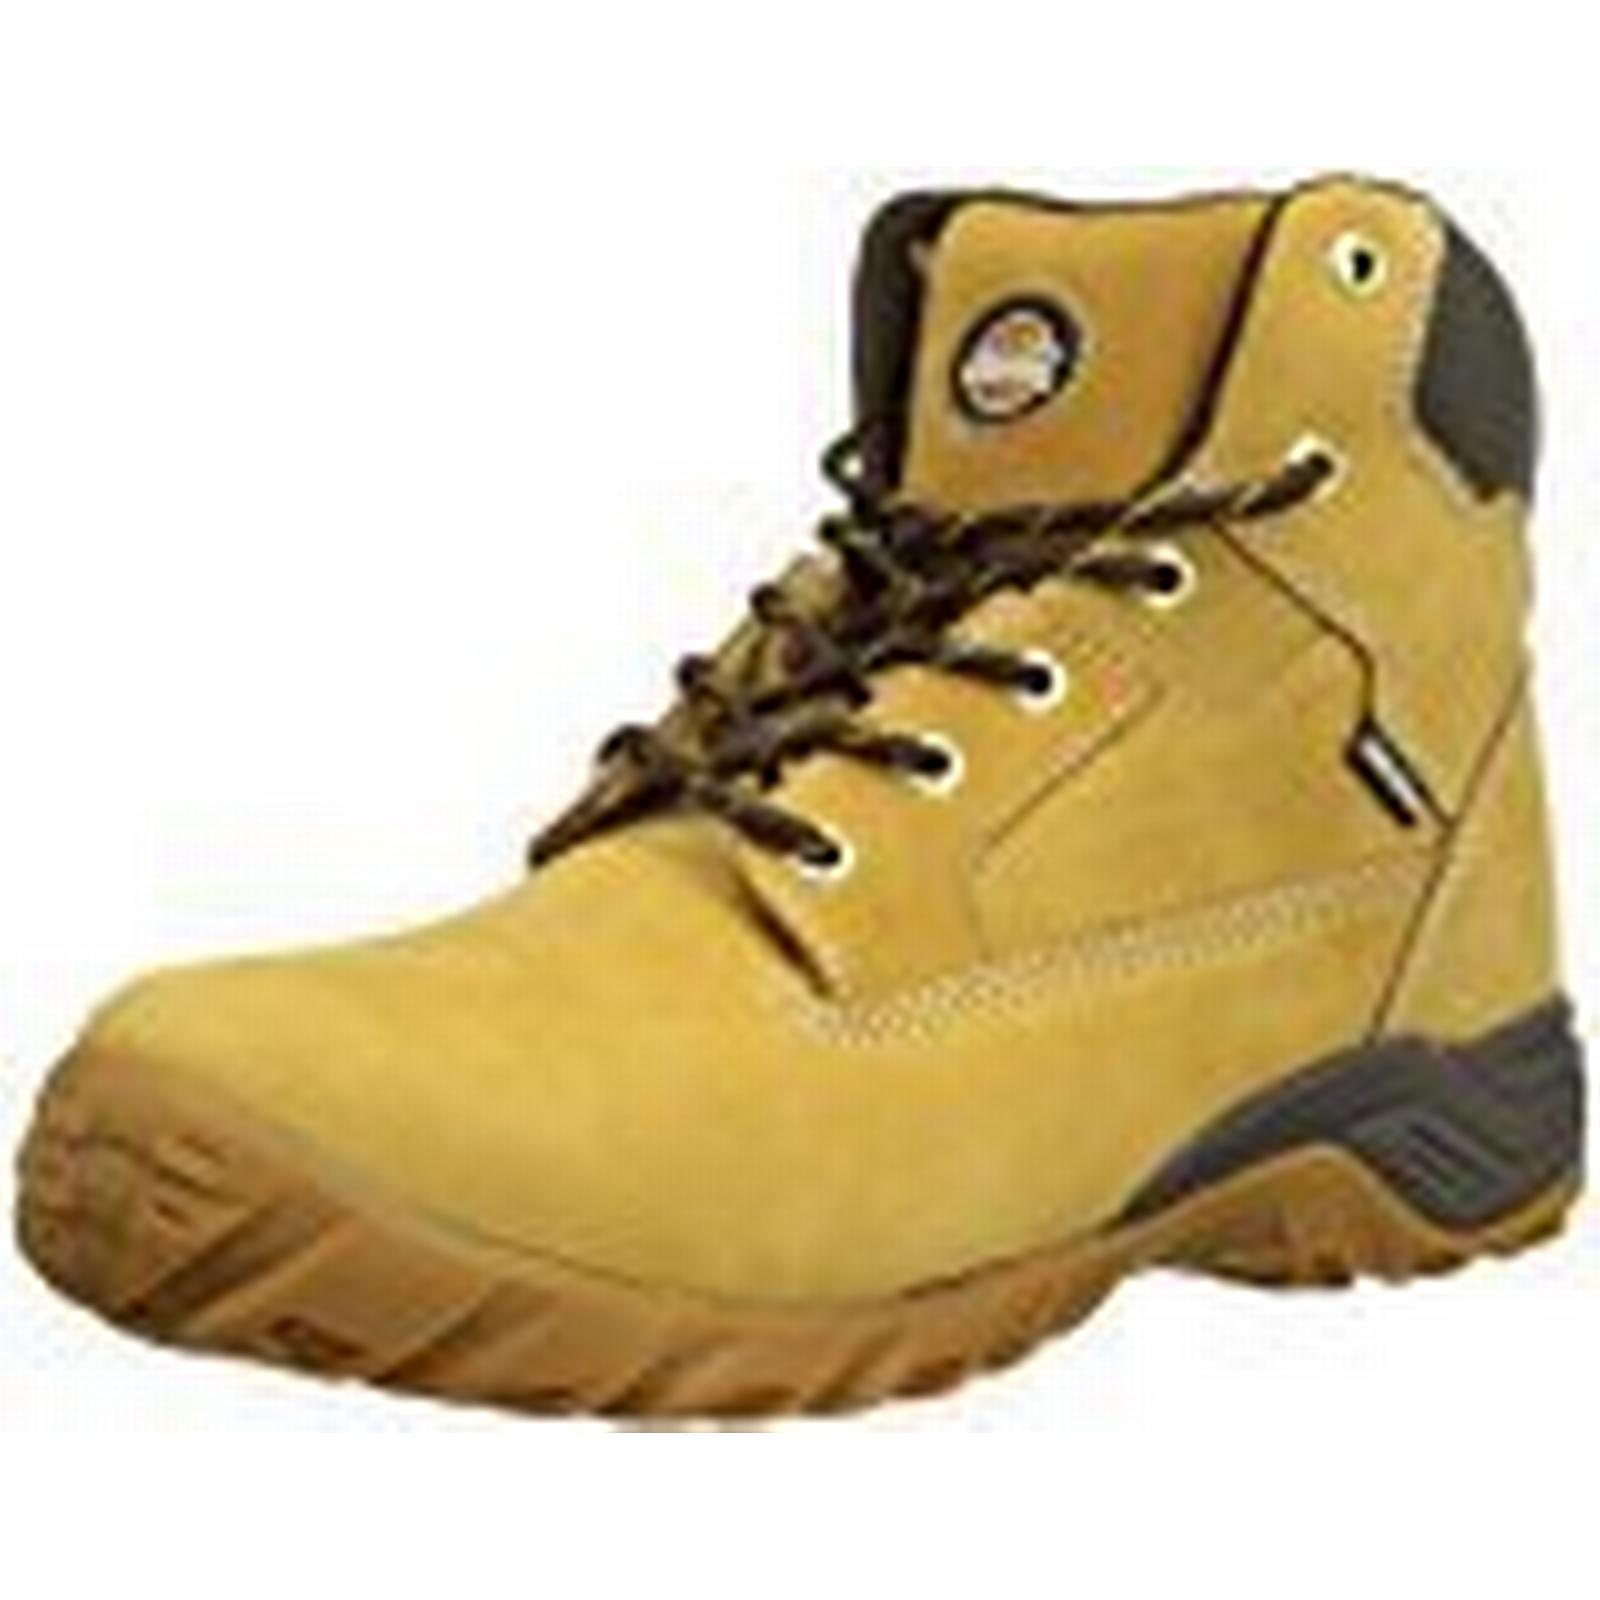 DICKIES Honey, Granton, Men's Chelsea Boots, Honey, DICKIES 11.5 UK (46 EU) 7e5666